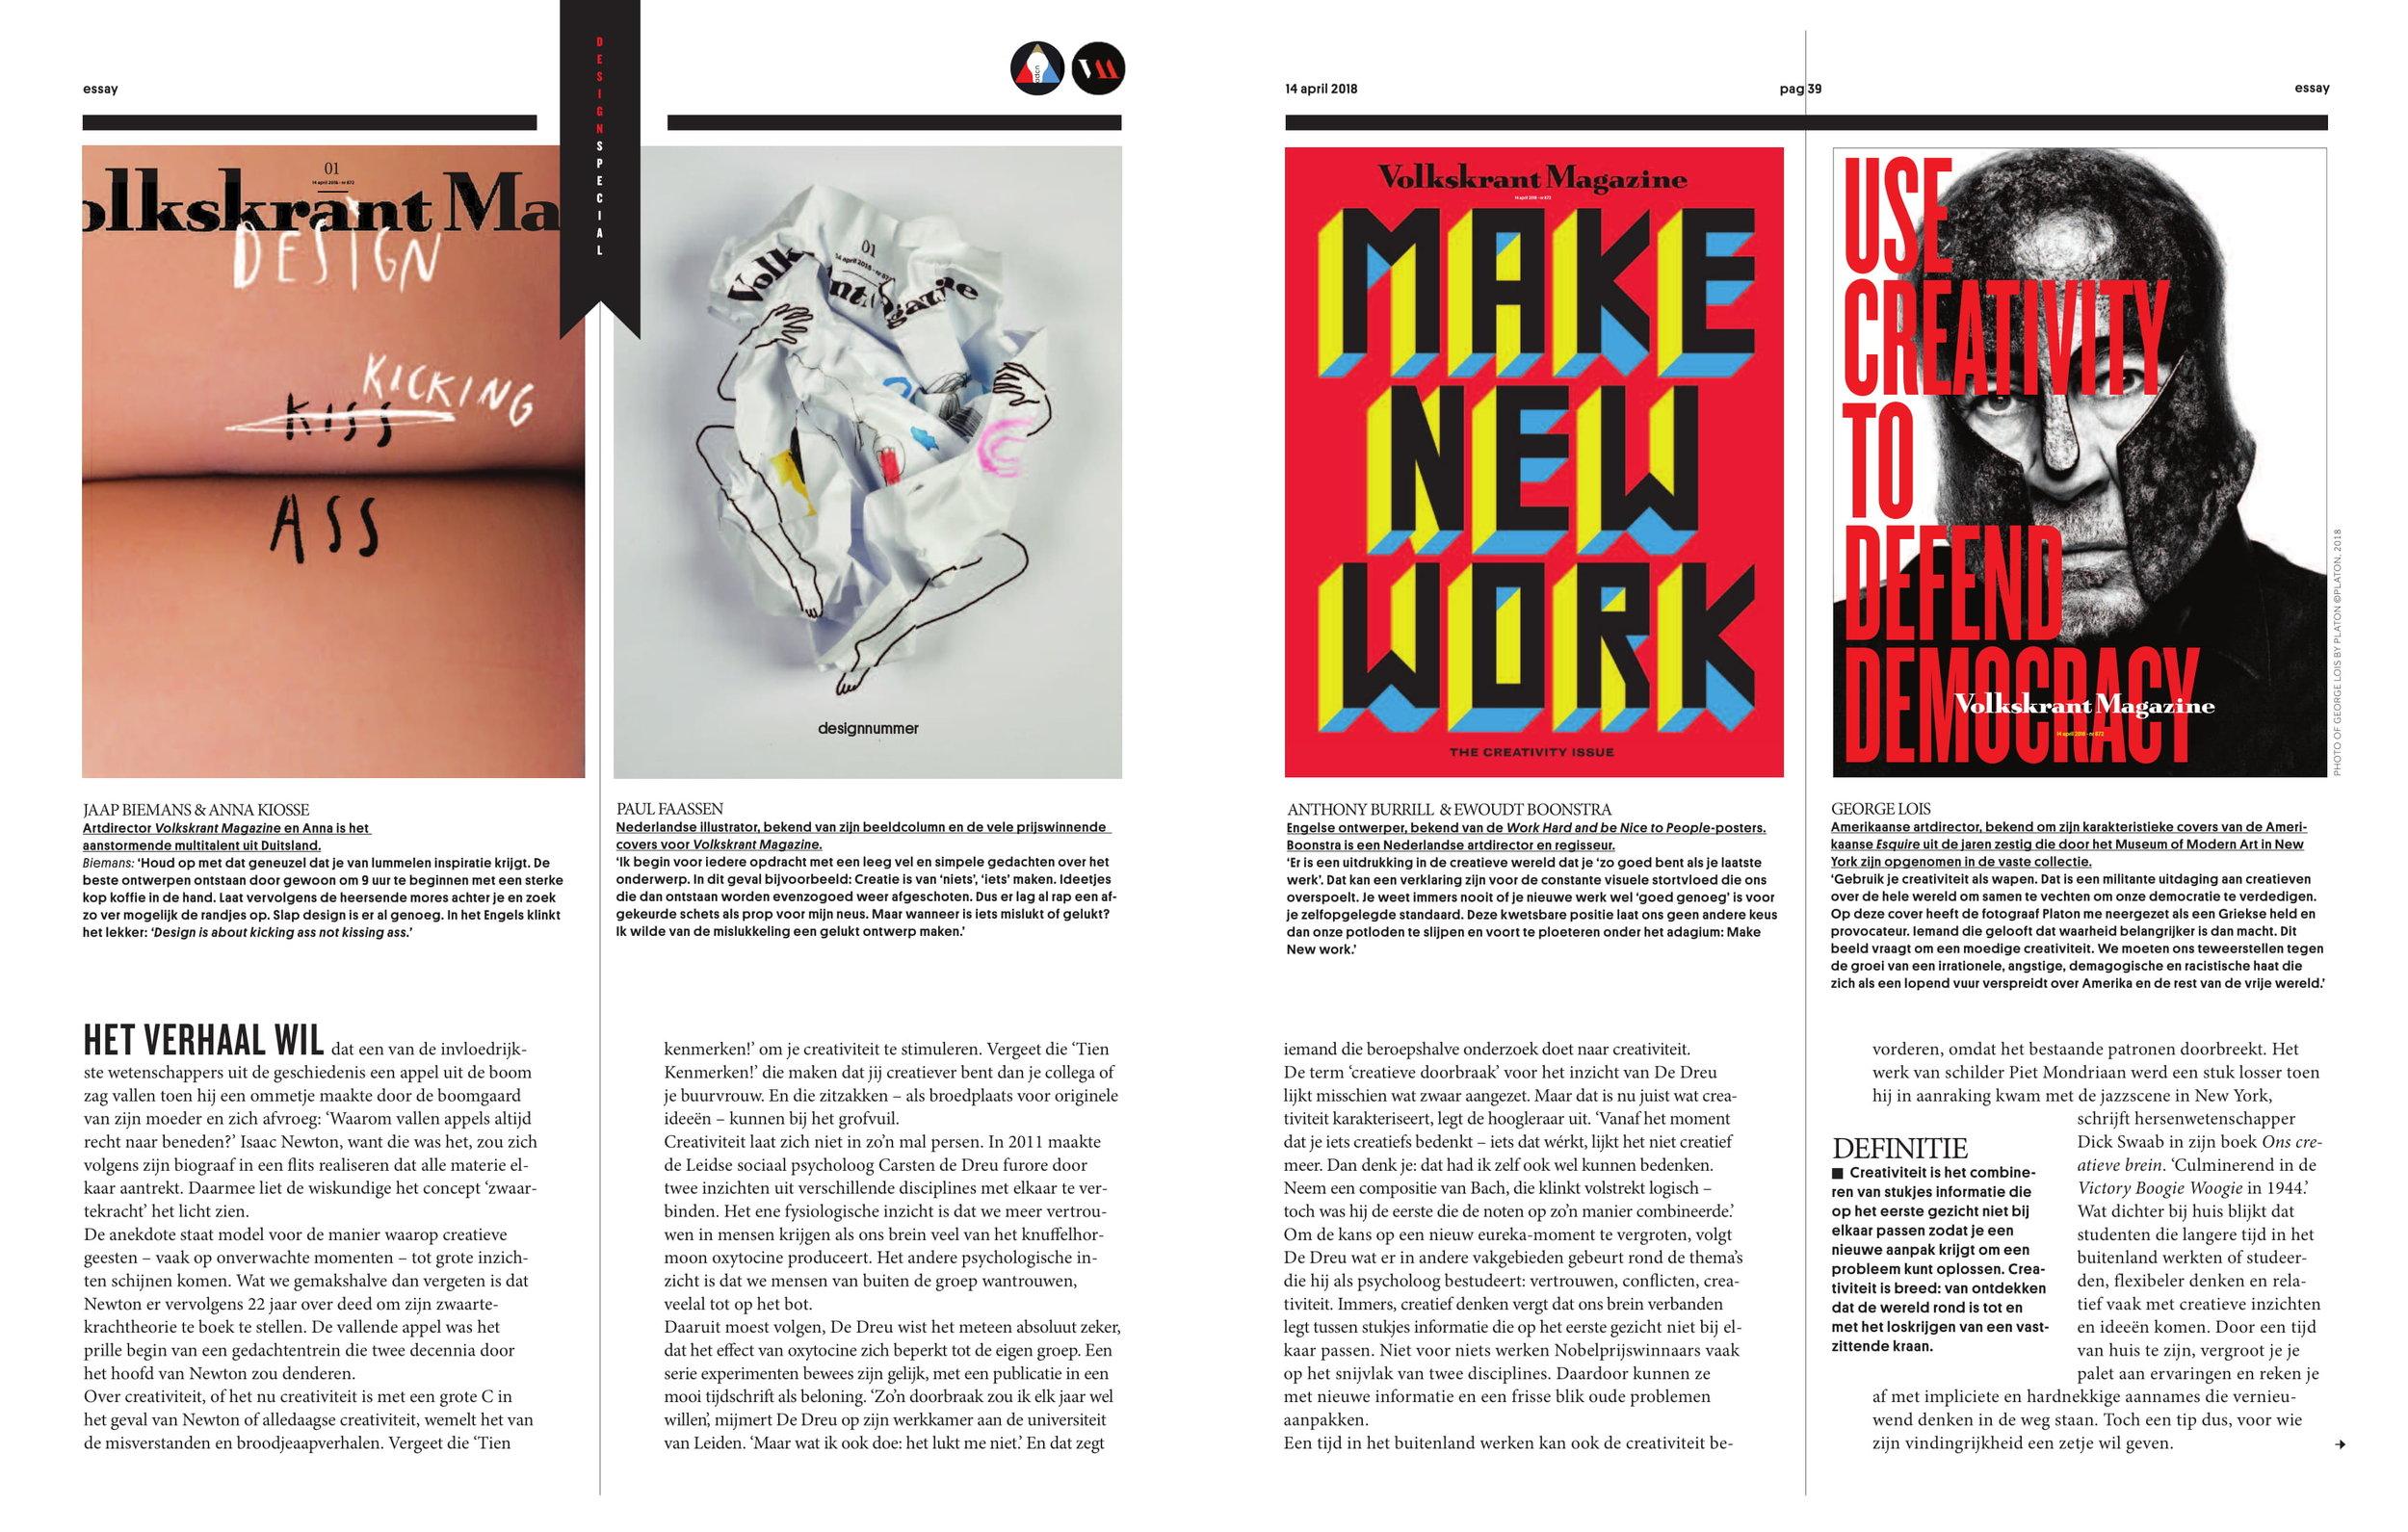 about creativity artikel-2.jpg